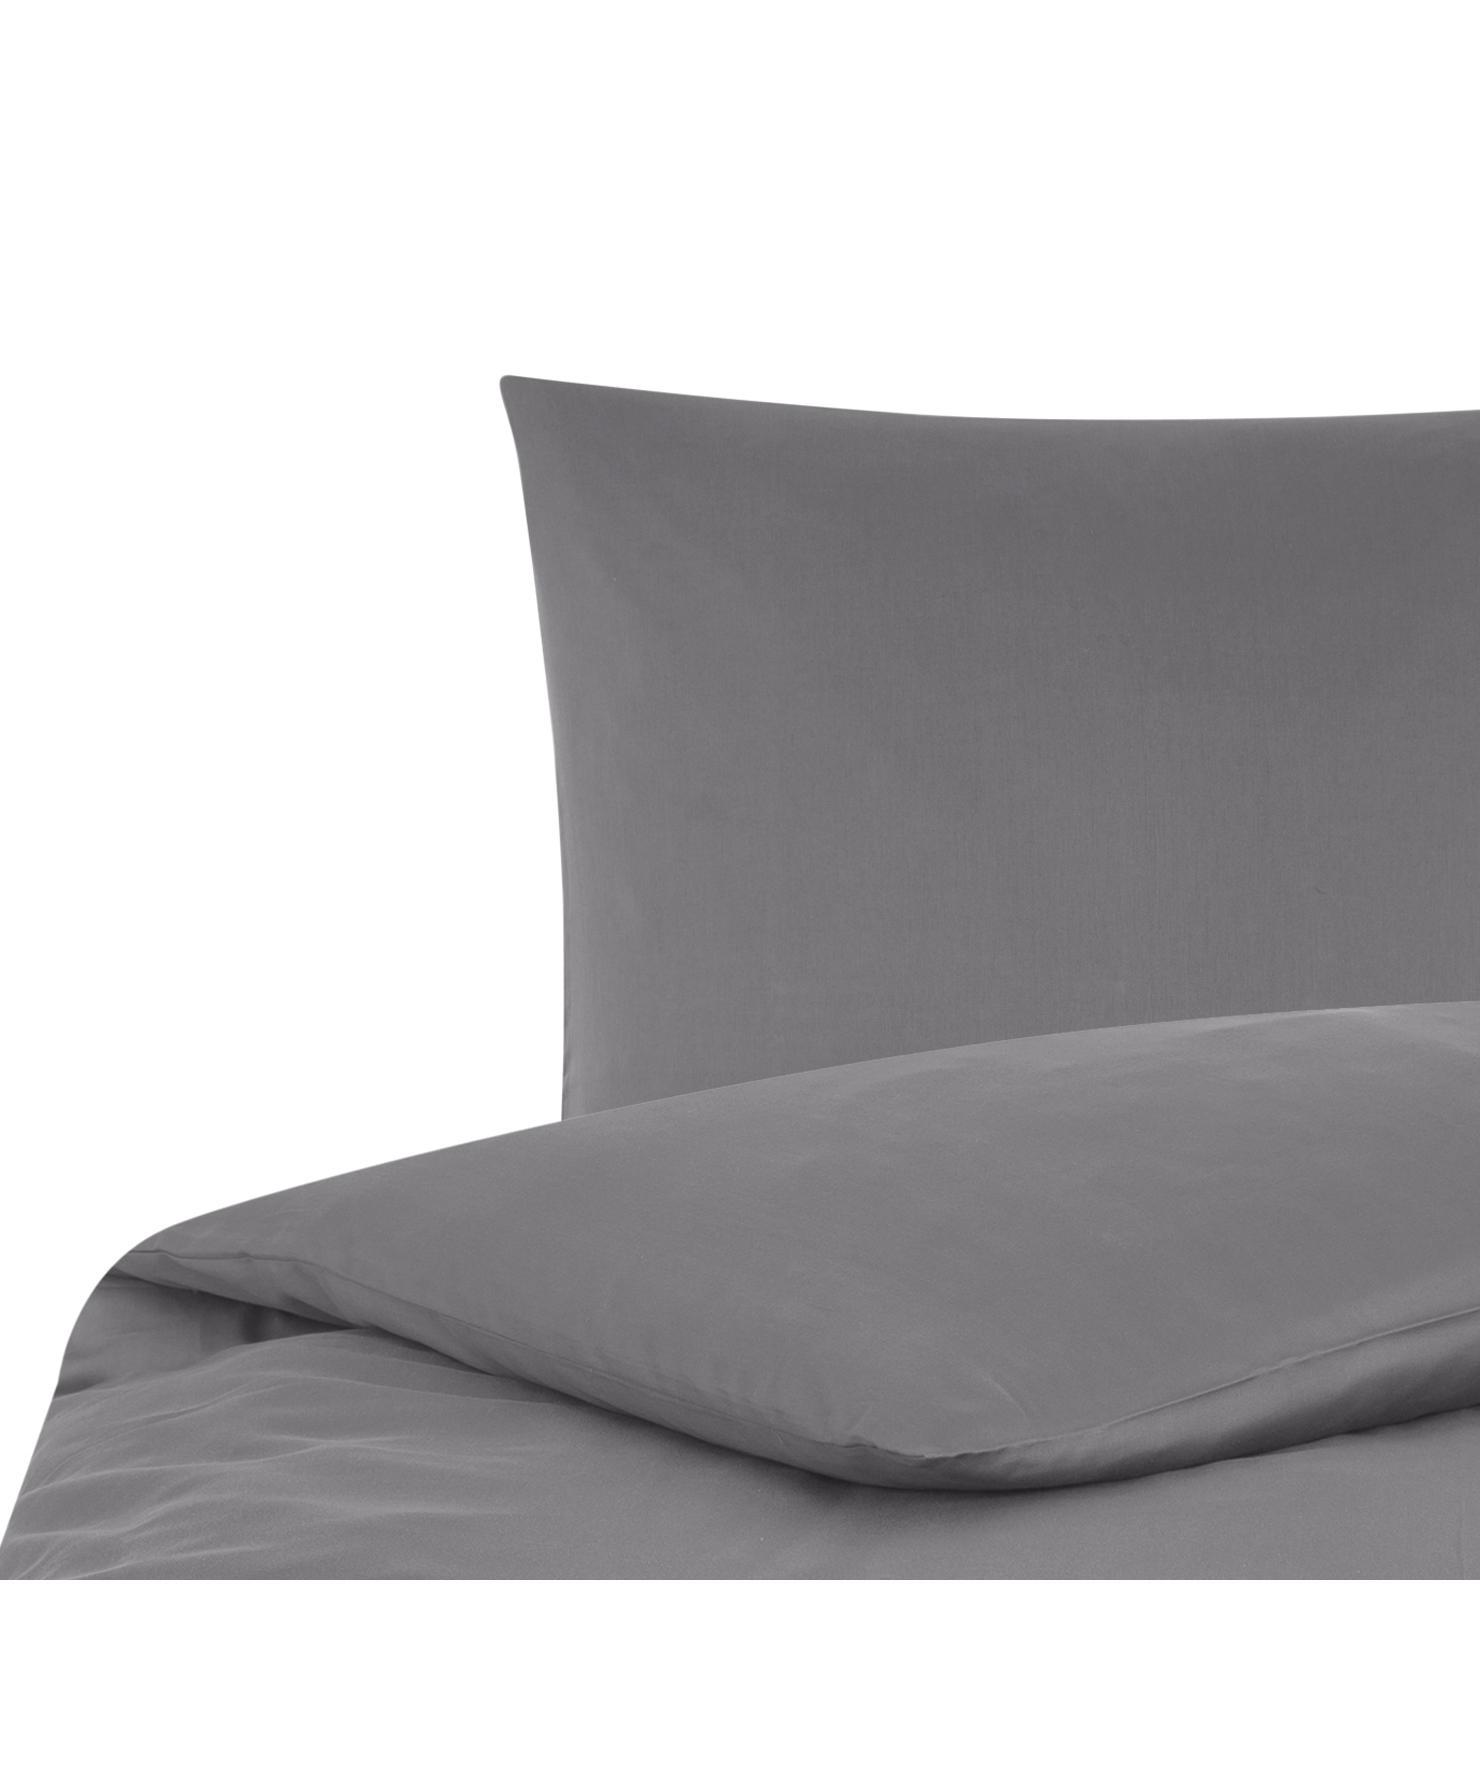 Baumwollsatin-Bettwäsche Comfort in Dunkelgrau, Webart: Satin Fadendichte 250 TC,, Dunkelgrau, 155 x 220 cm + 1 Kissen 80 x 80 cm